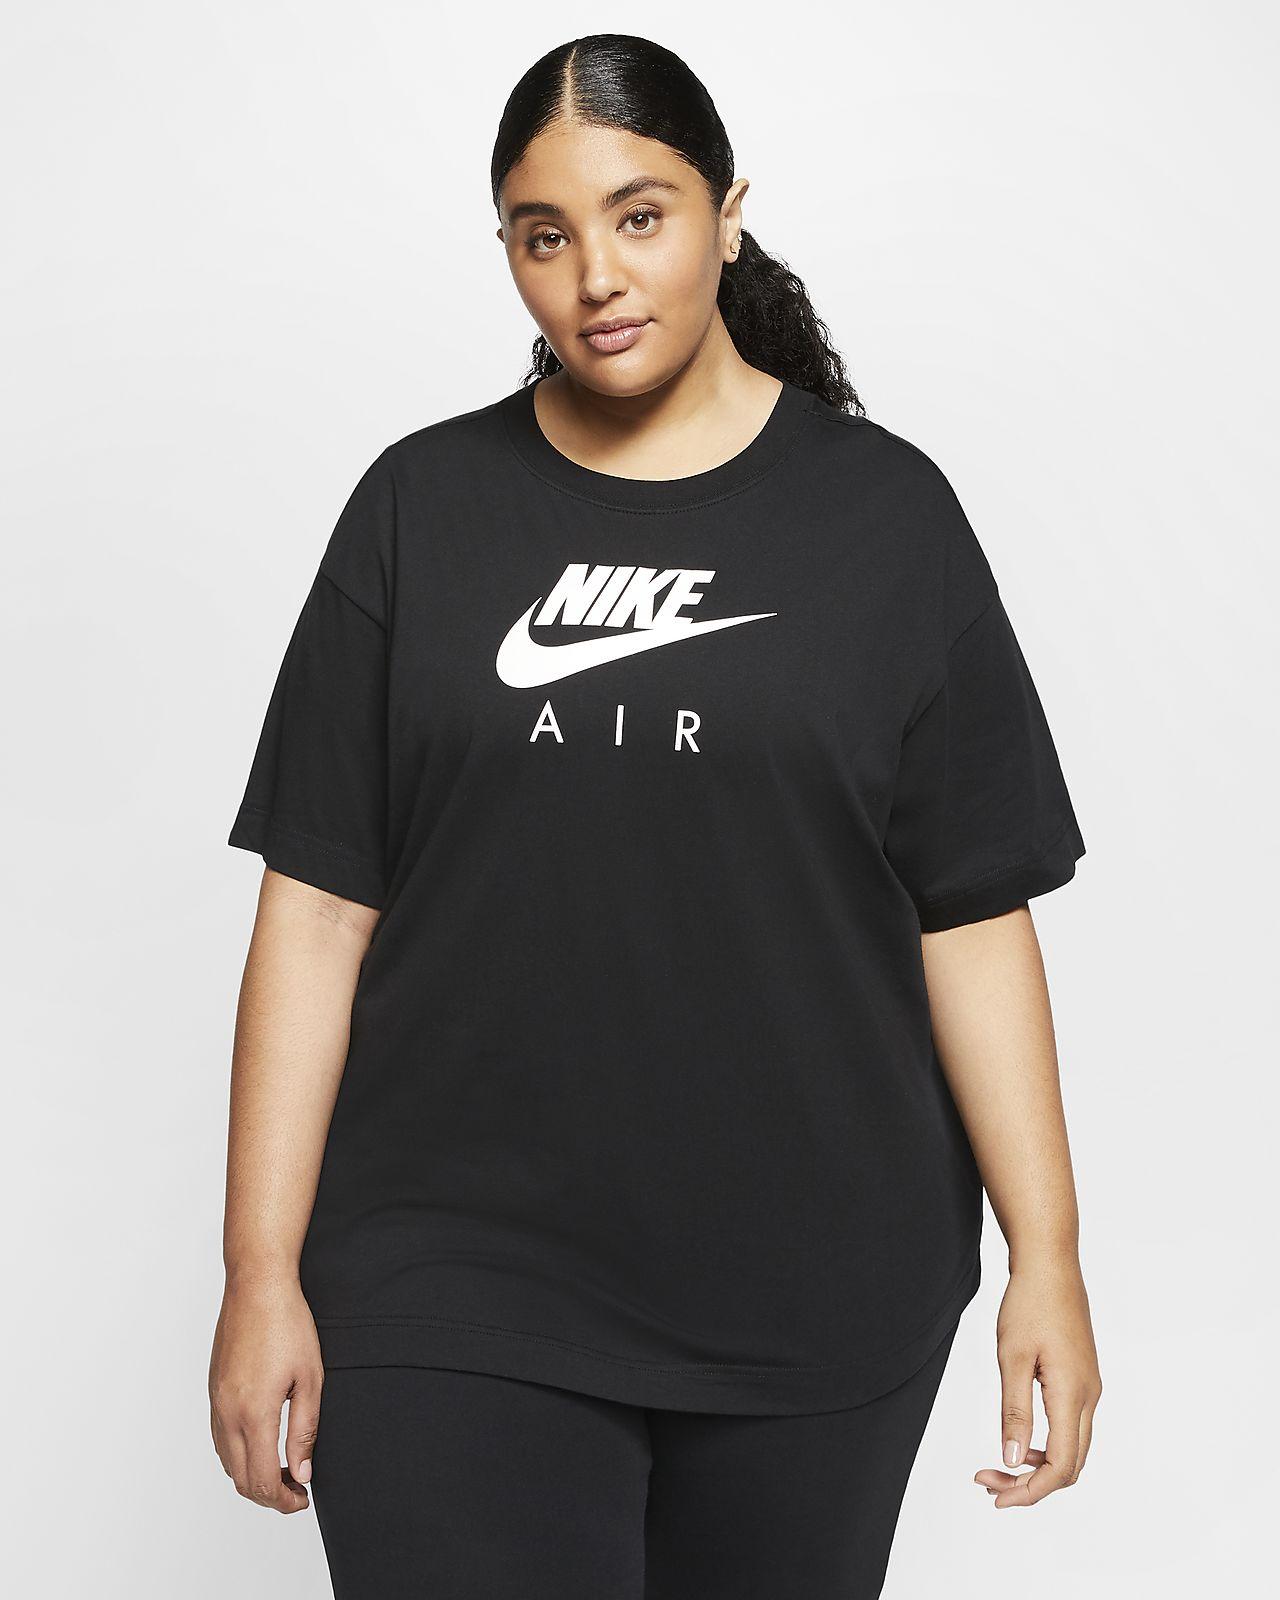 Air Camiseta de manga corta